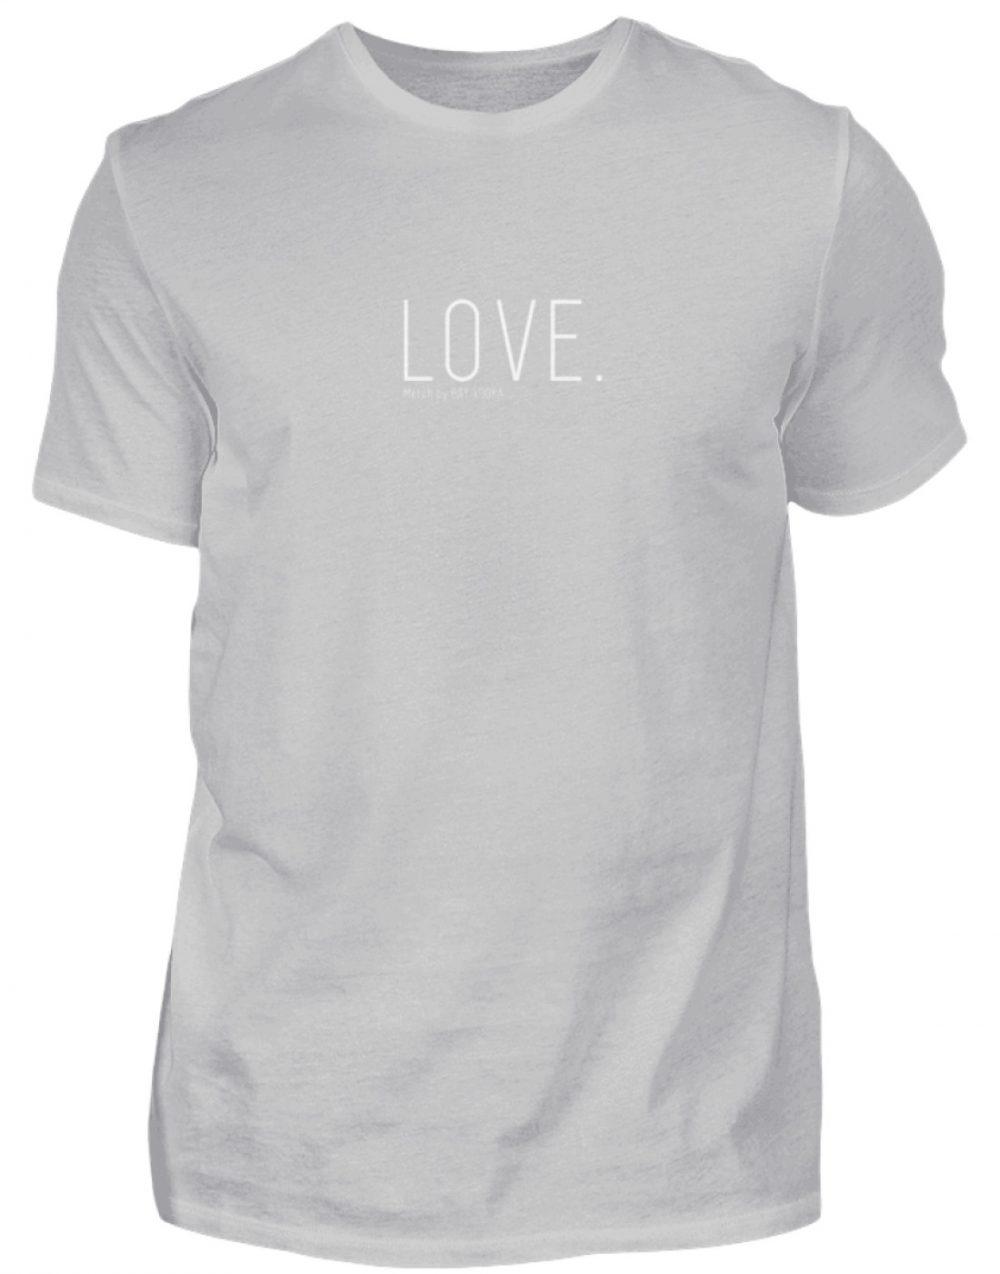 LOVE. - Herren Shirt-1157